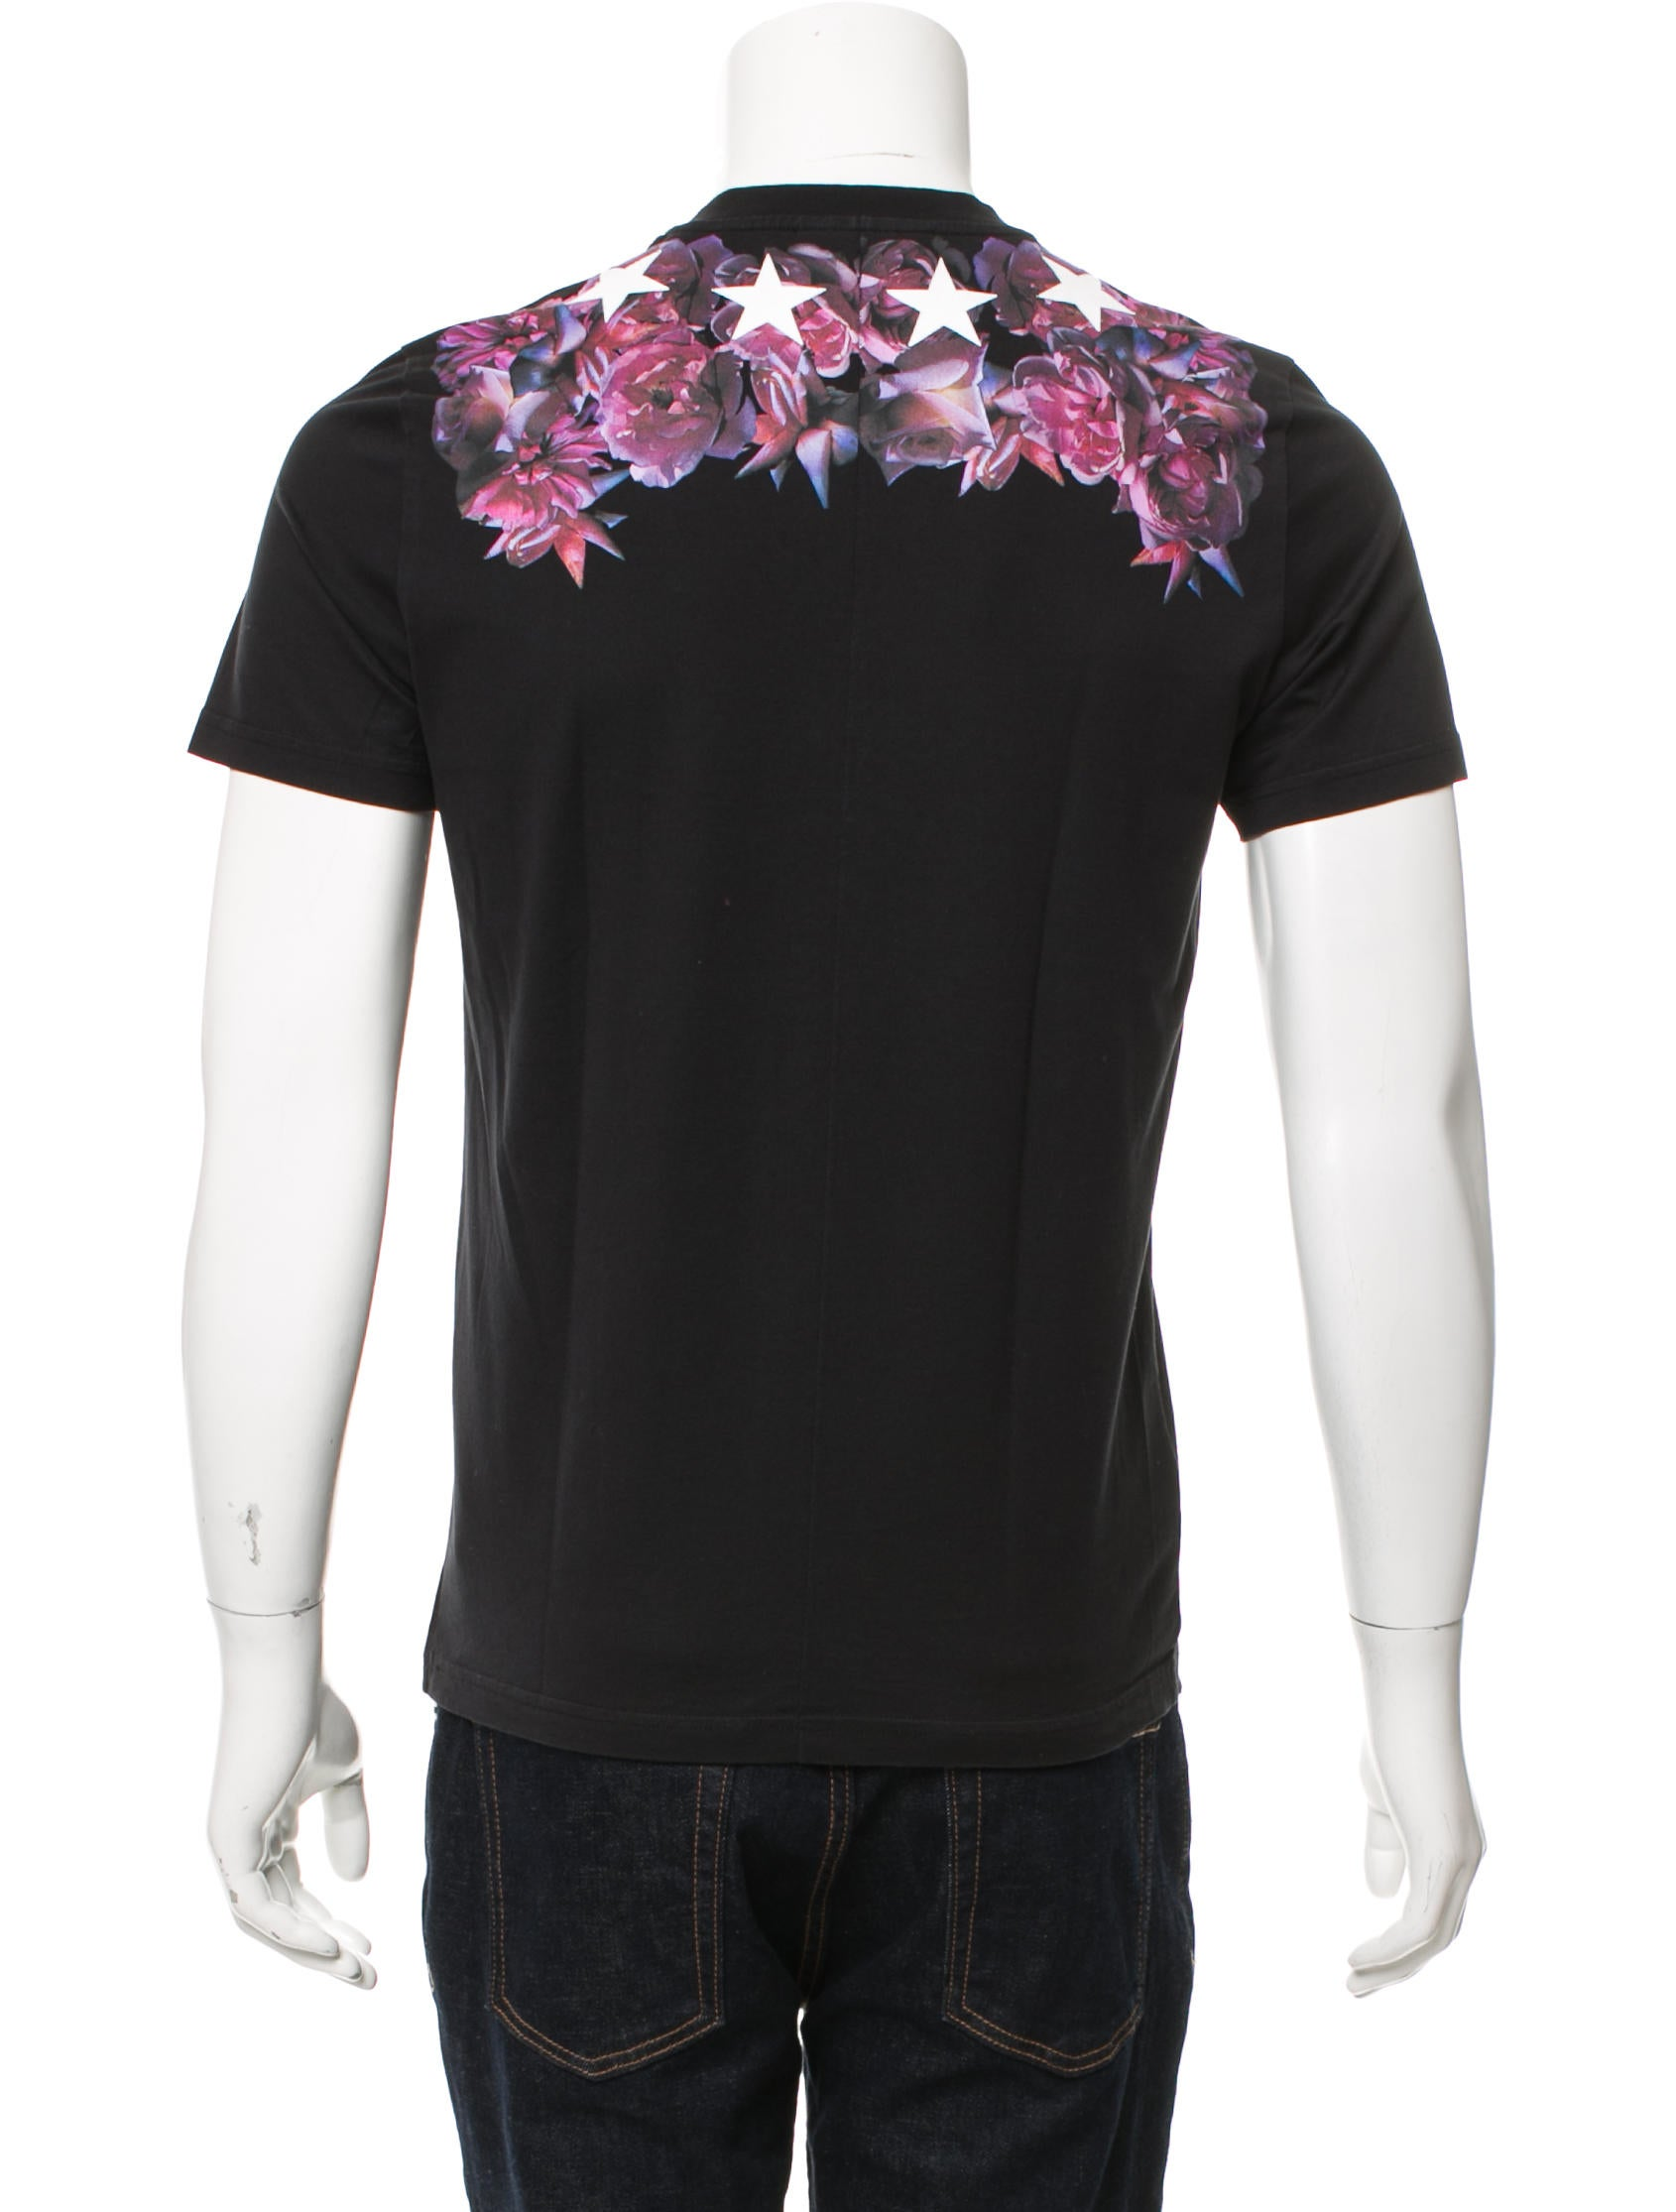 Givenchy roses stars print t shirt clothing giv46213 Givenchy t shirt price